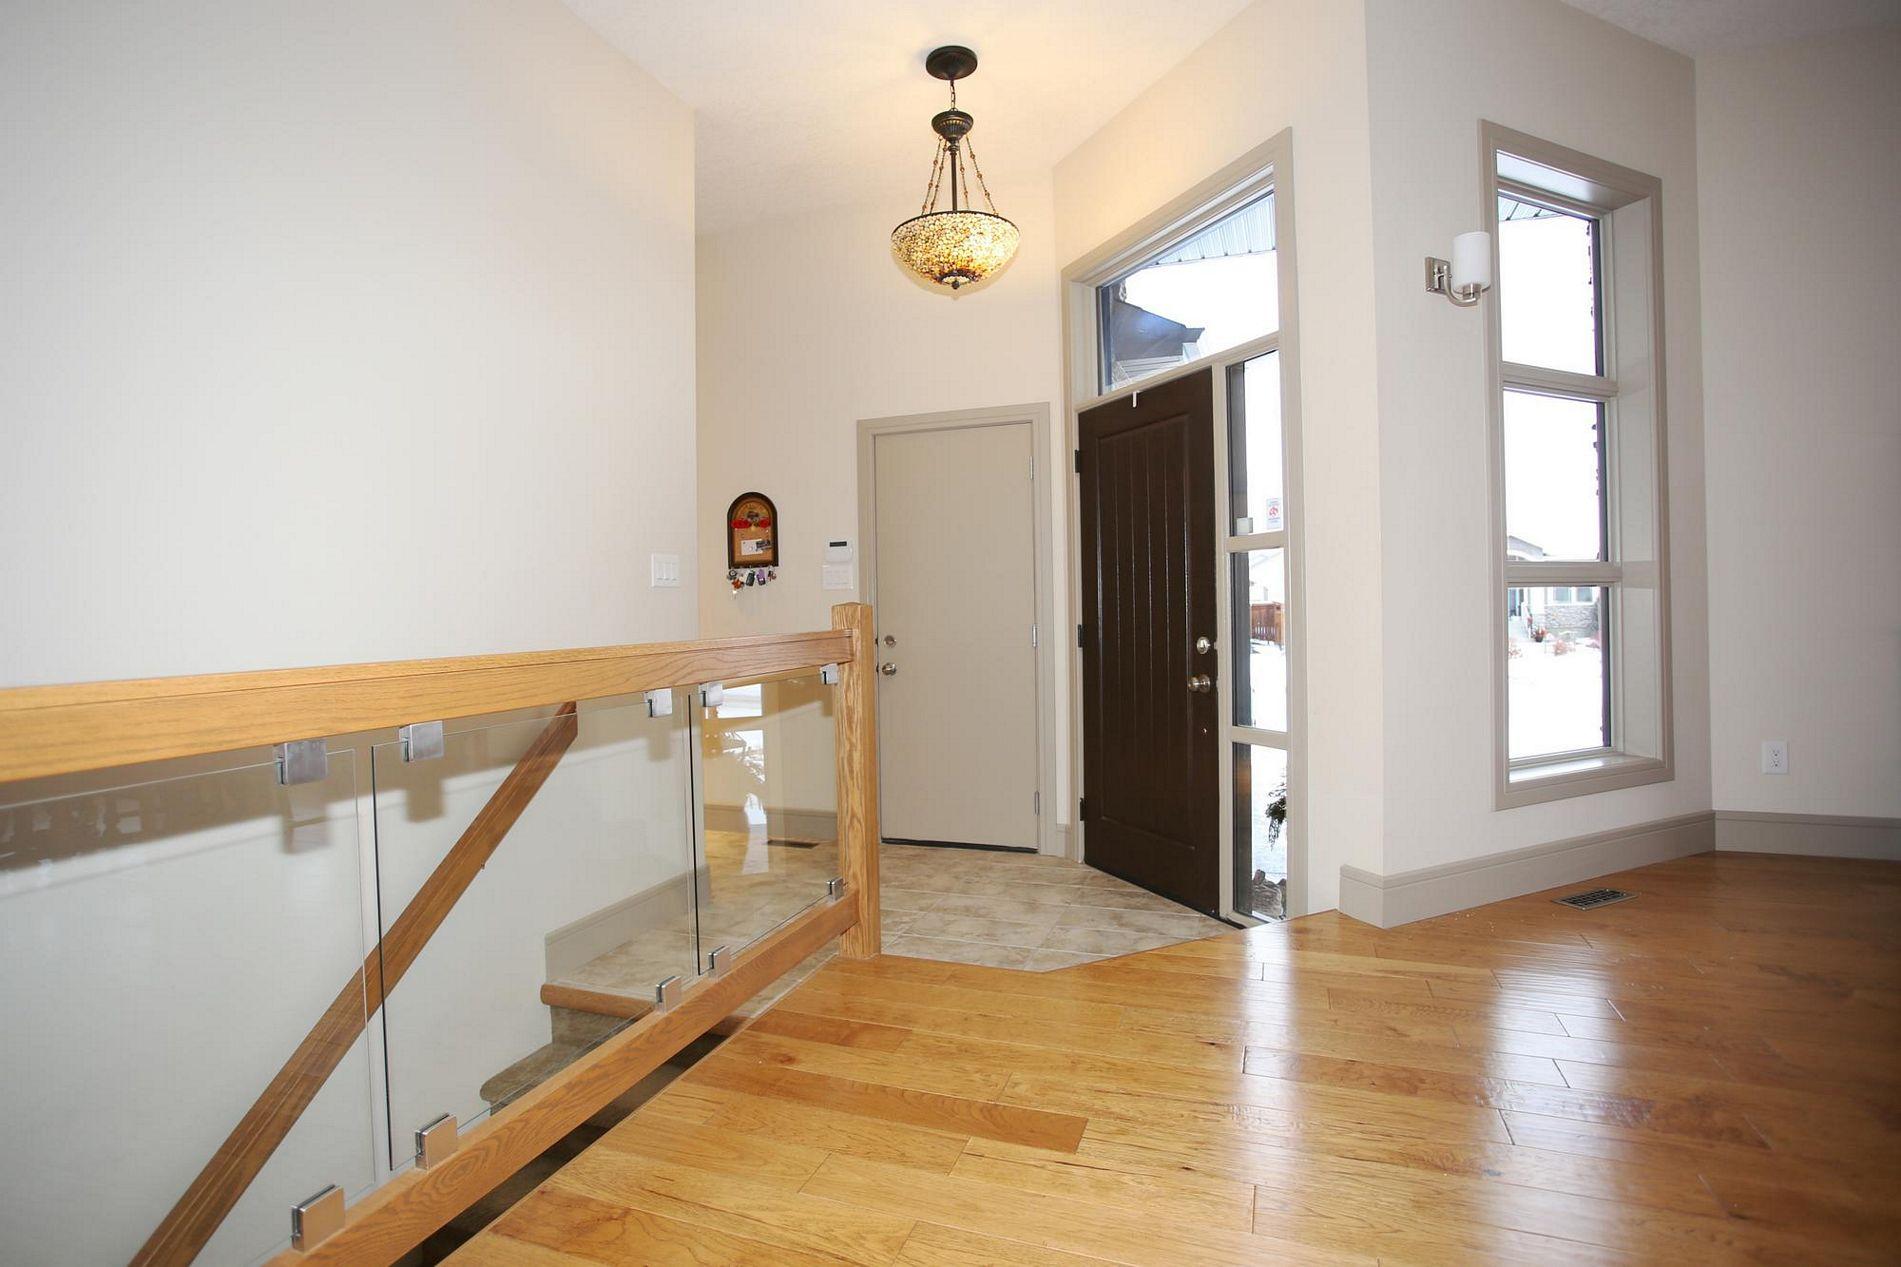 26 Edenwood Place, Winnipeg, Manitoba  R3X 0E4 - Photo 1 - 1831994